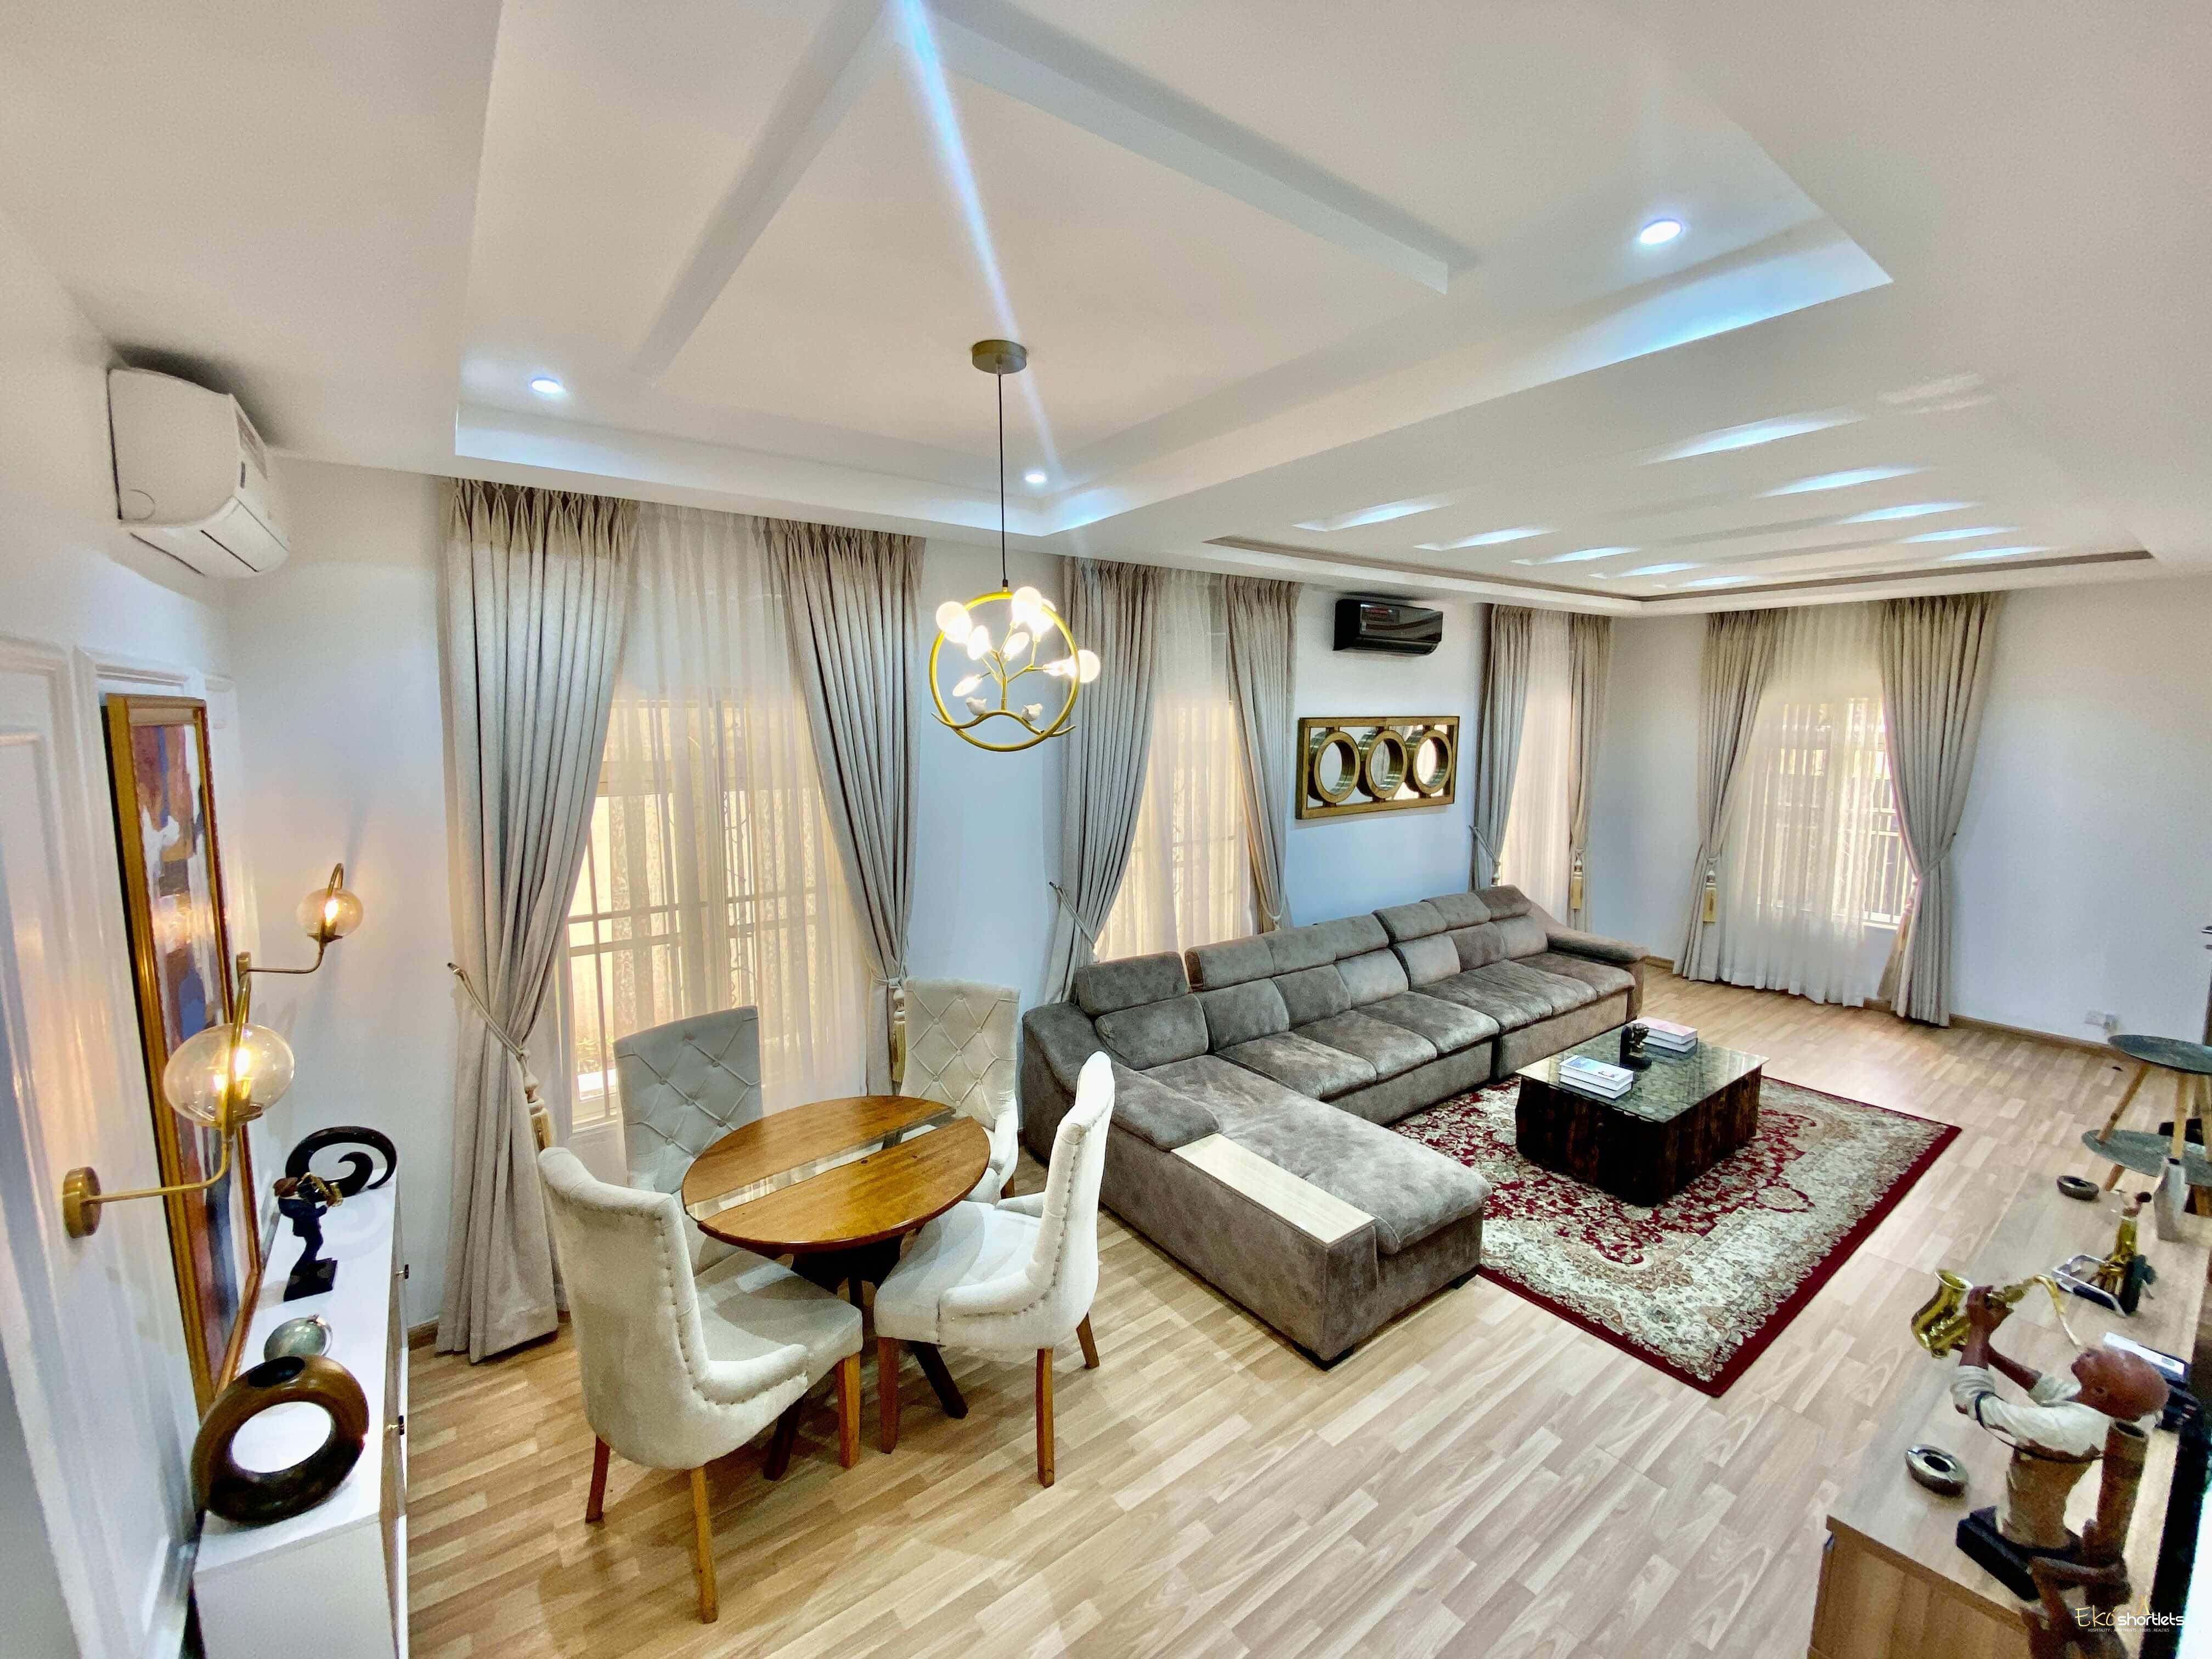 3 Bedroom Duplex - Coco's Home